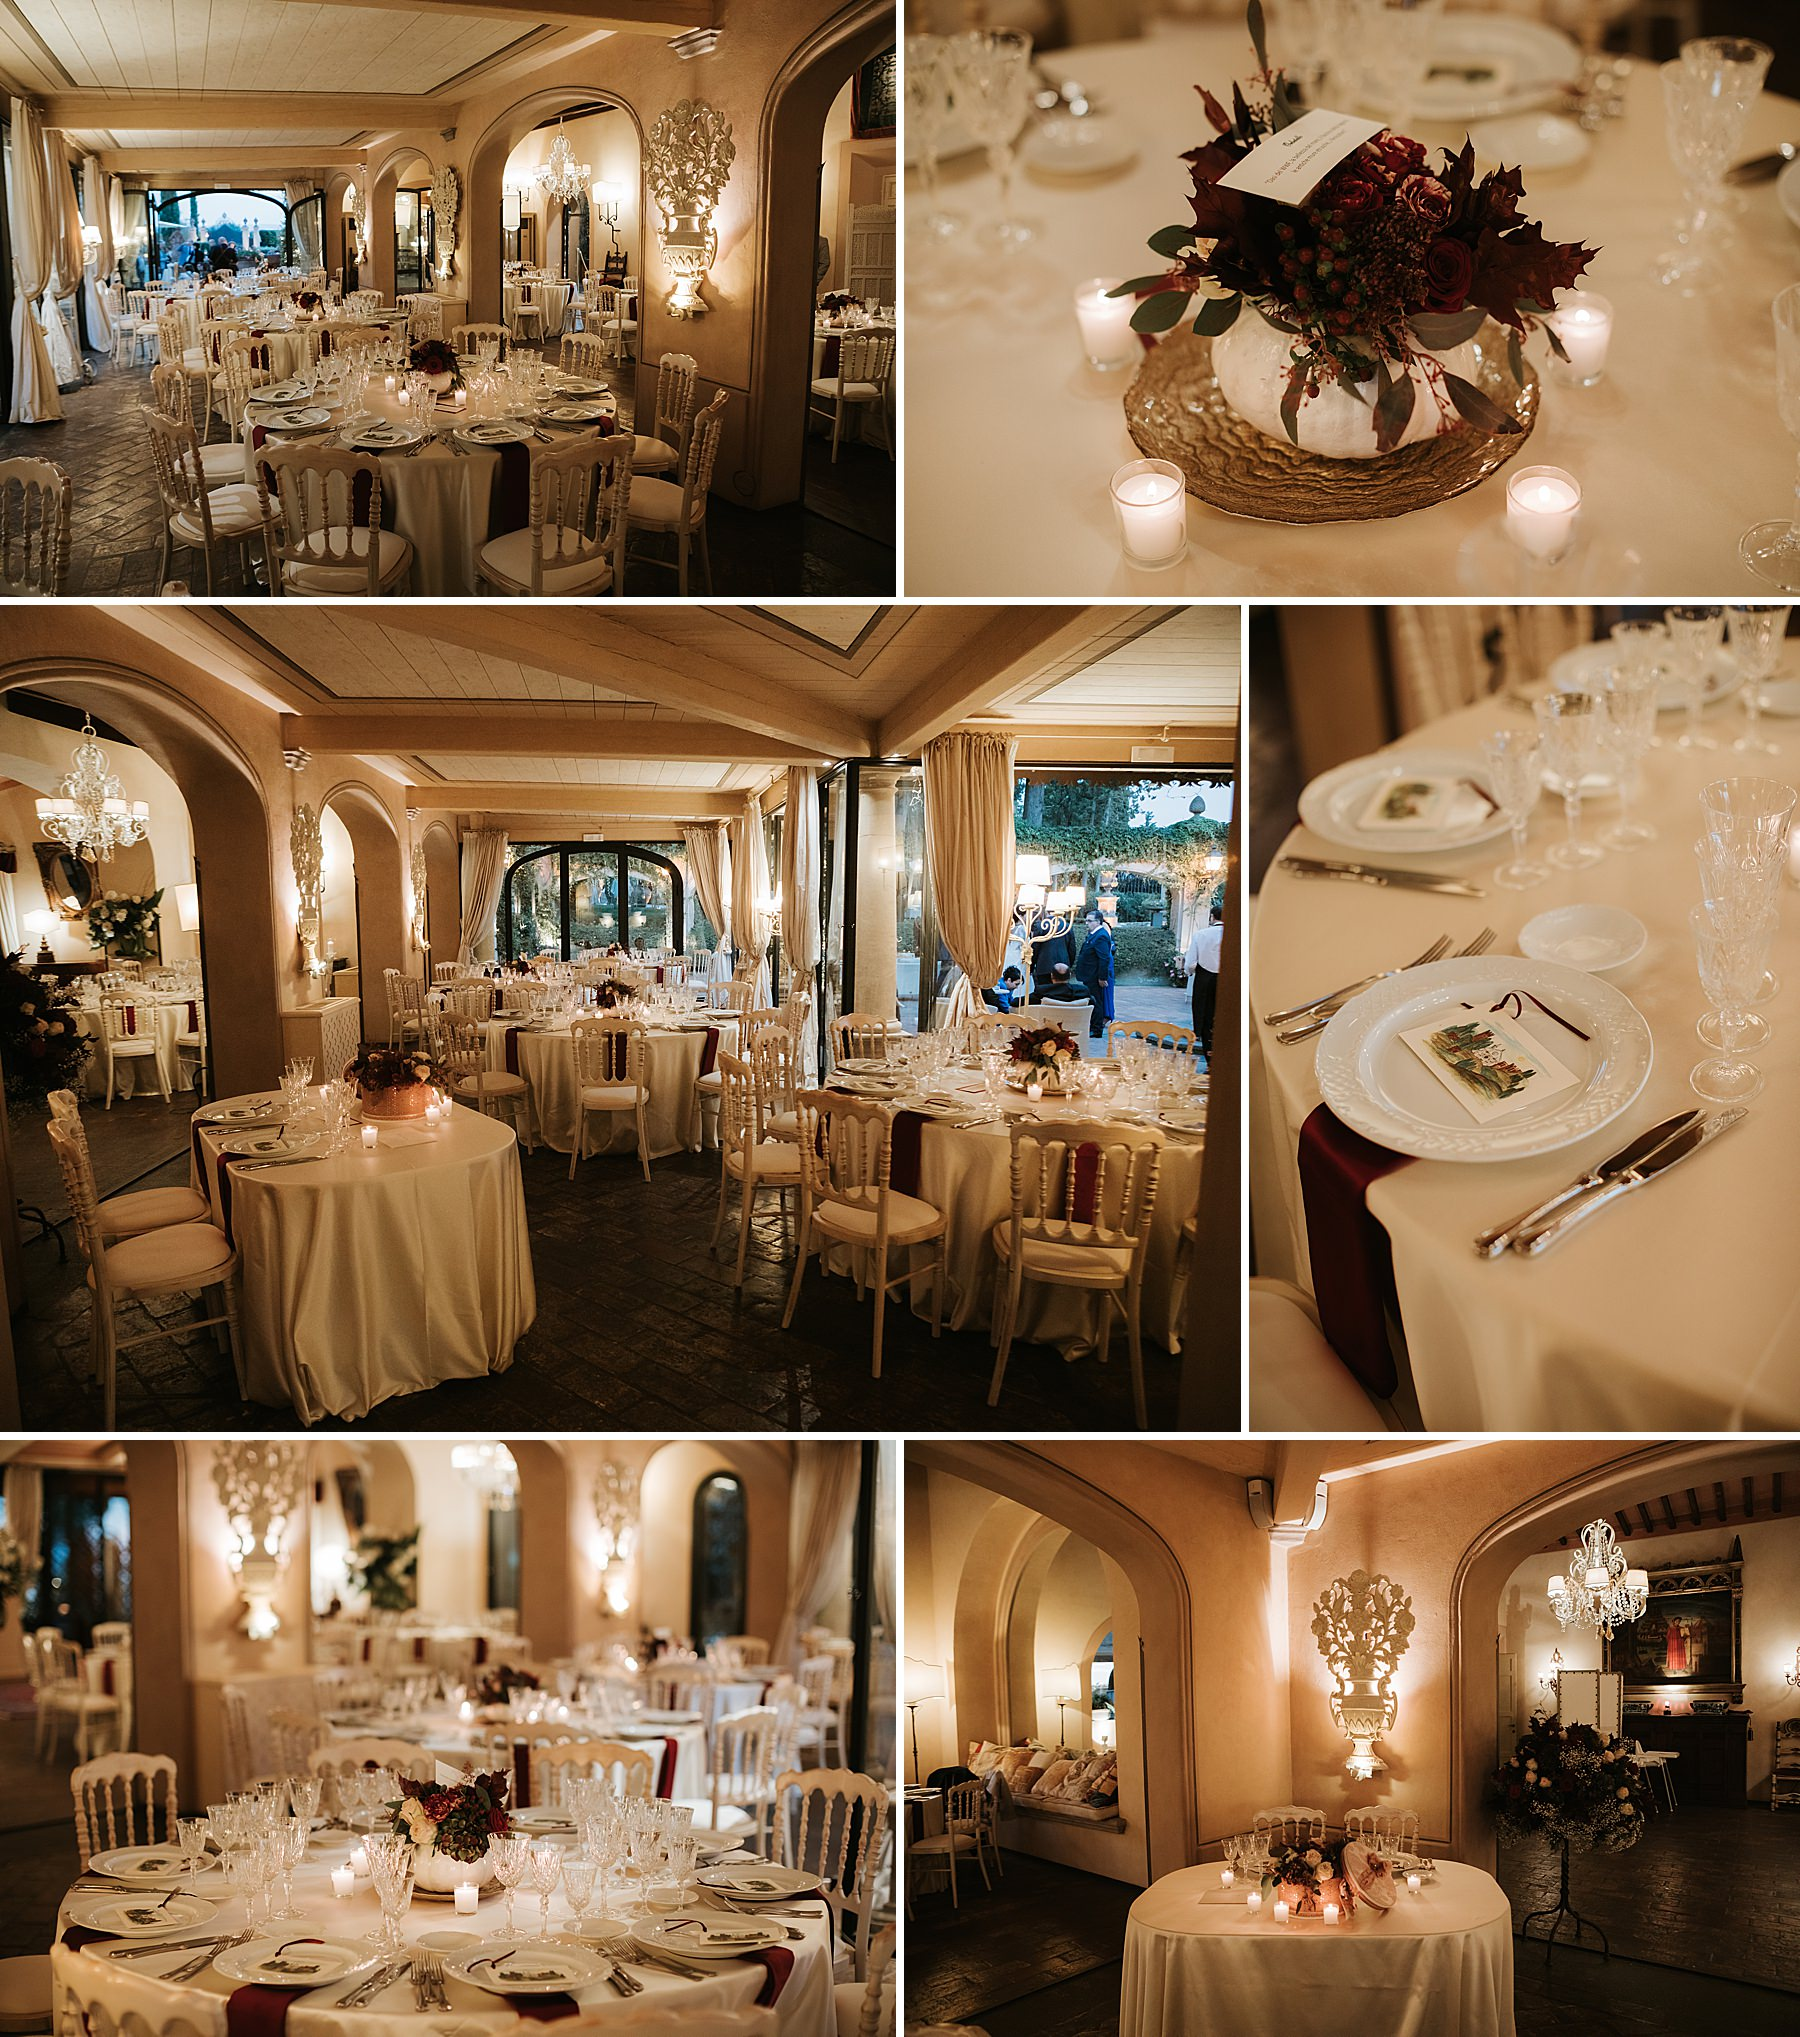 Matrimonio Antica Fattoria di Paterno catering roland's